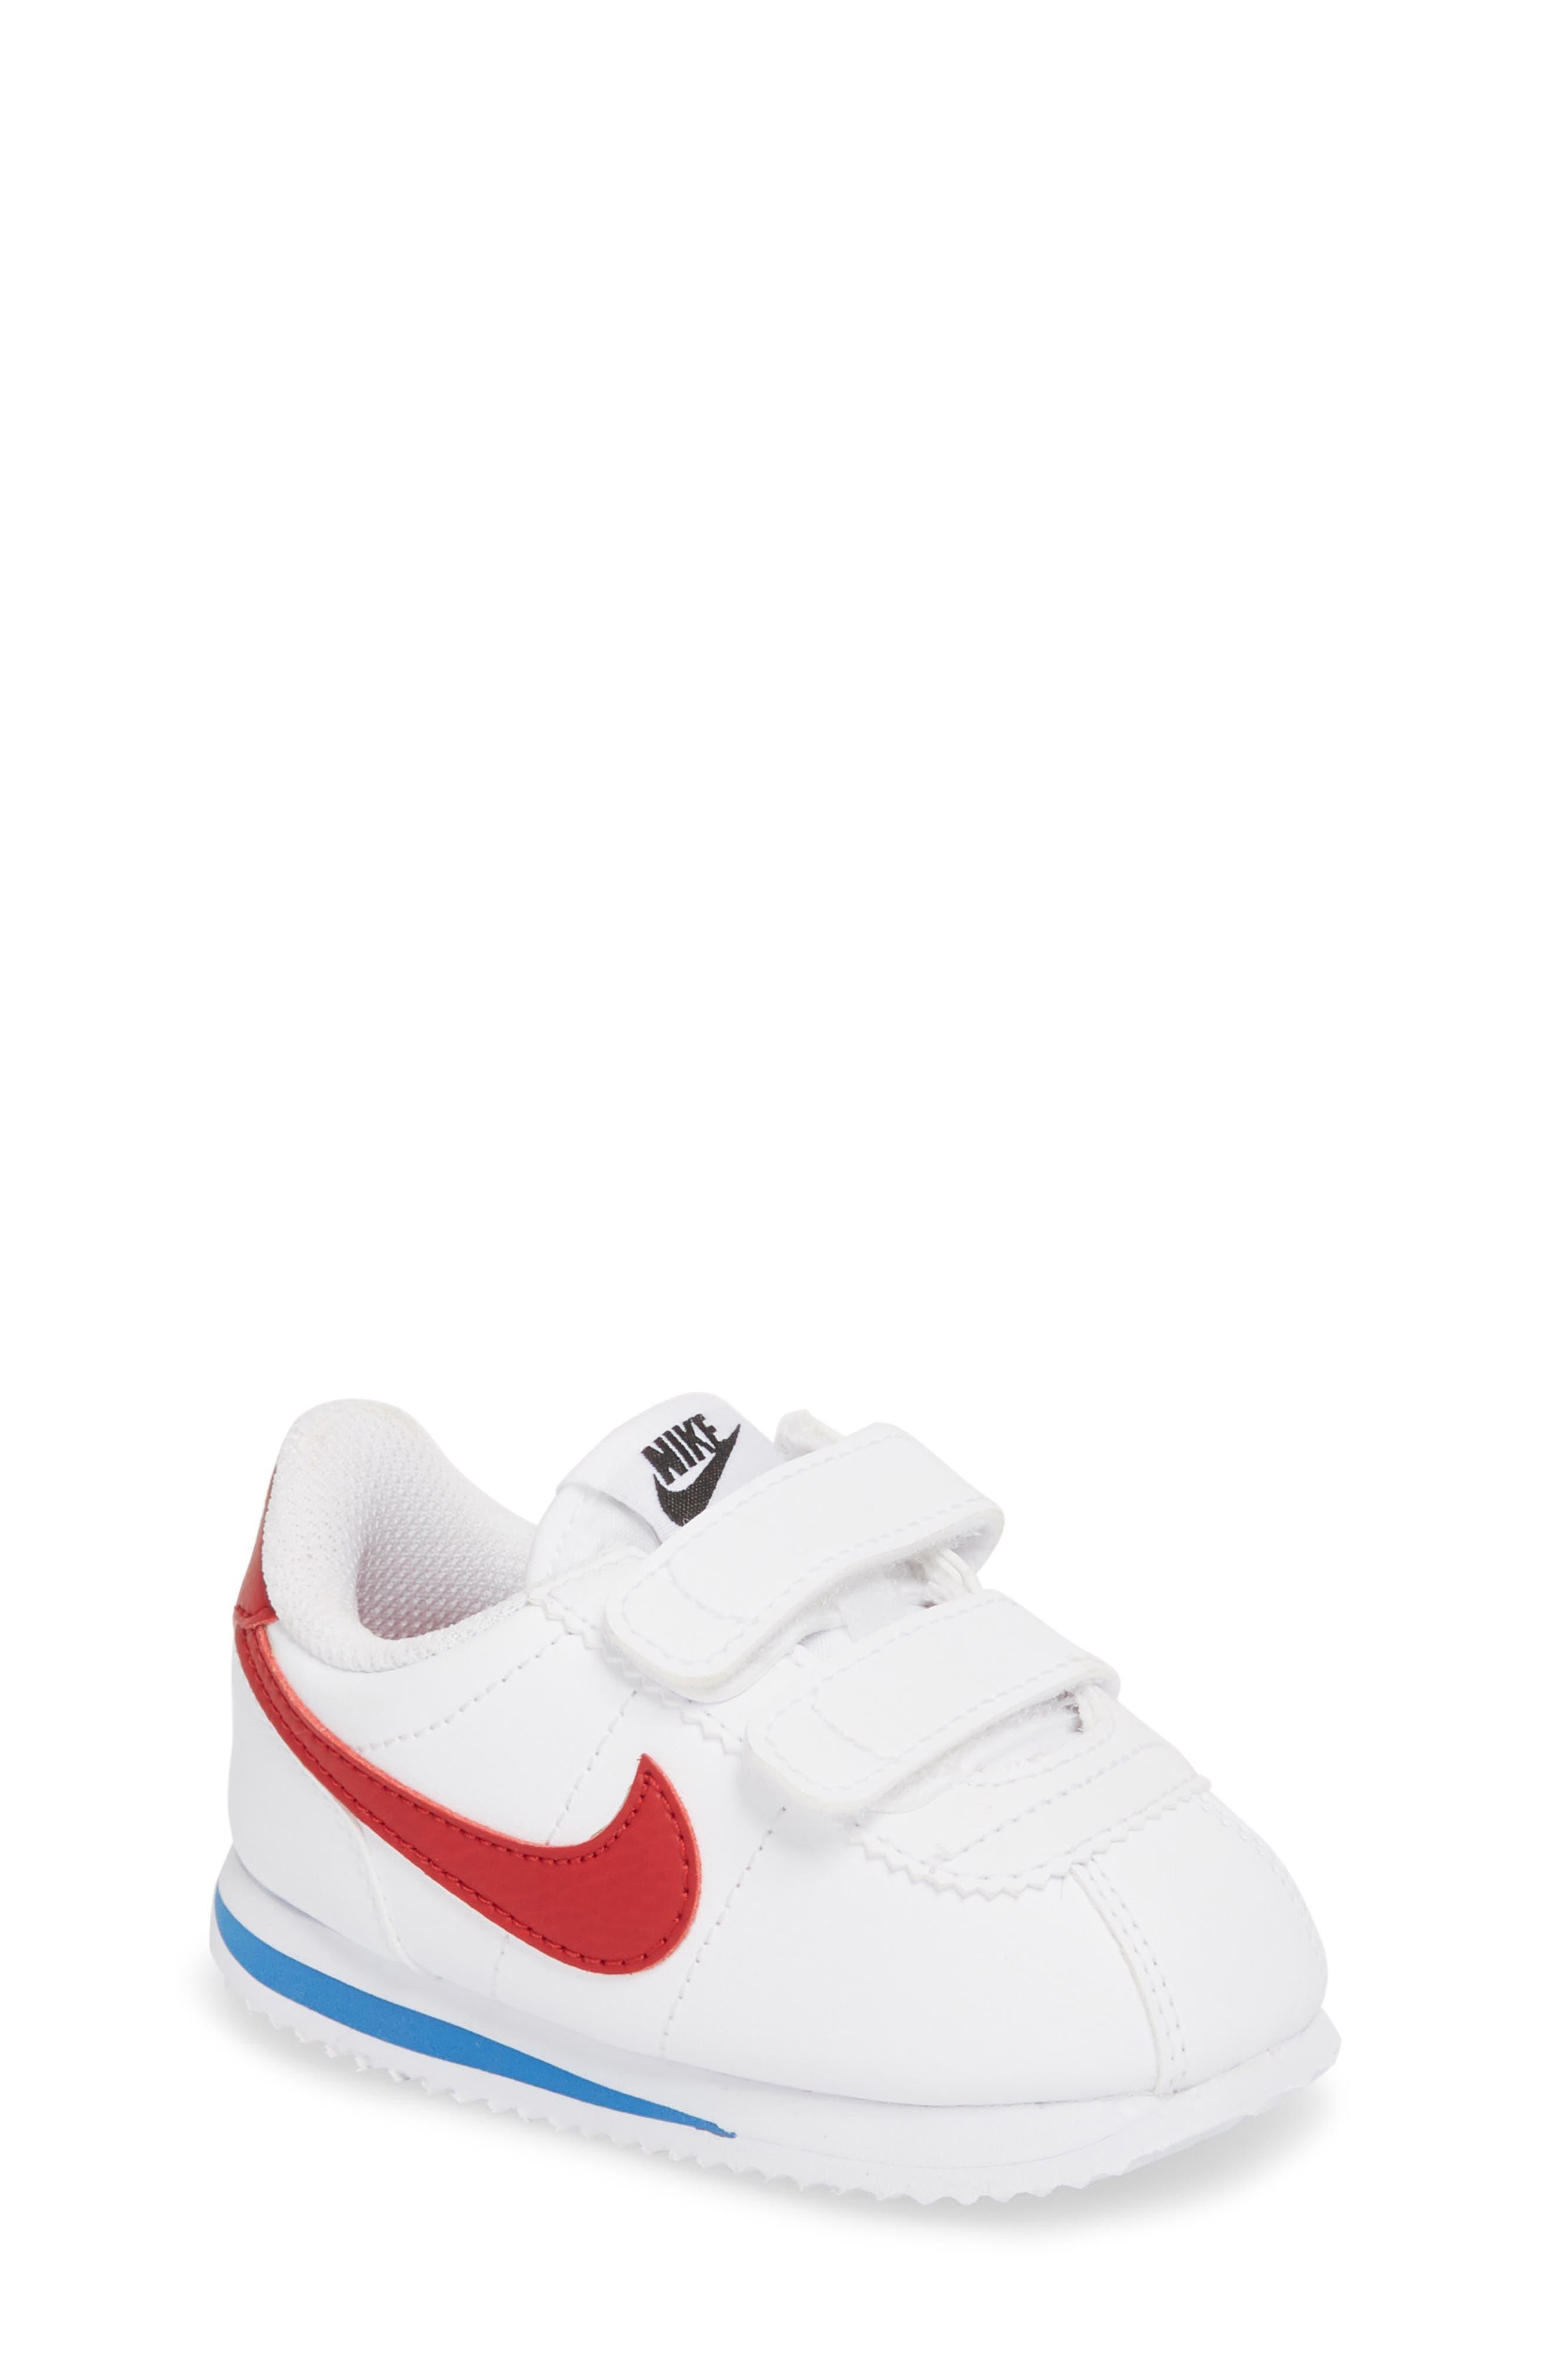 half off edc7f 194d0 ... low cost nike cortez basic sl sneaker baby walker toddler little kid  1adeb 77db8